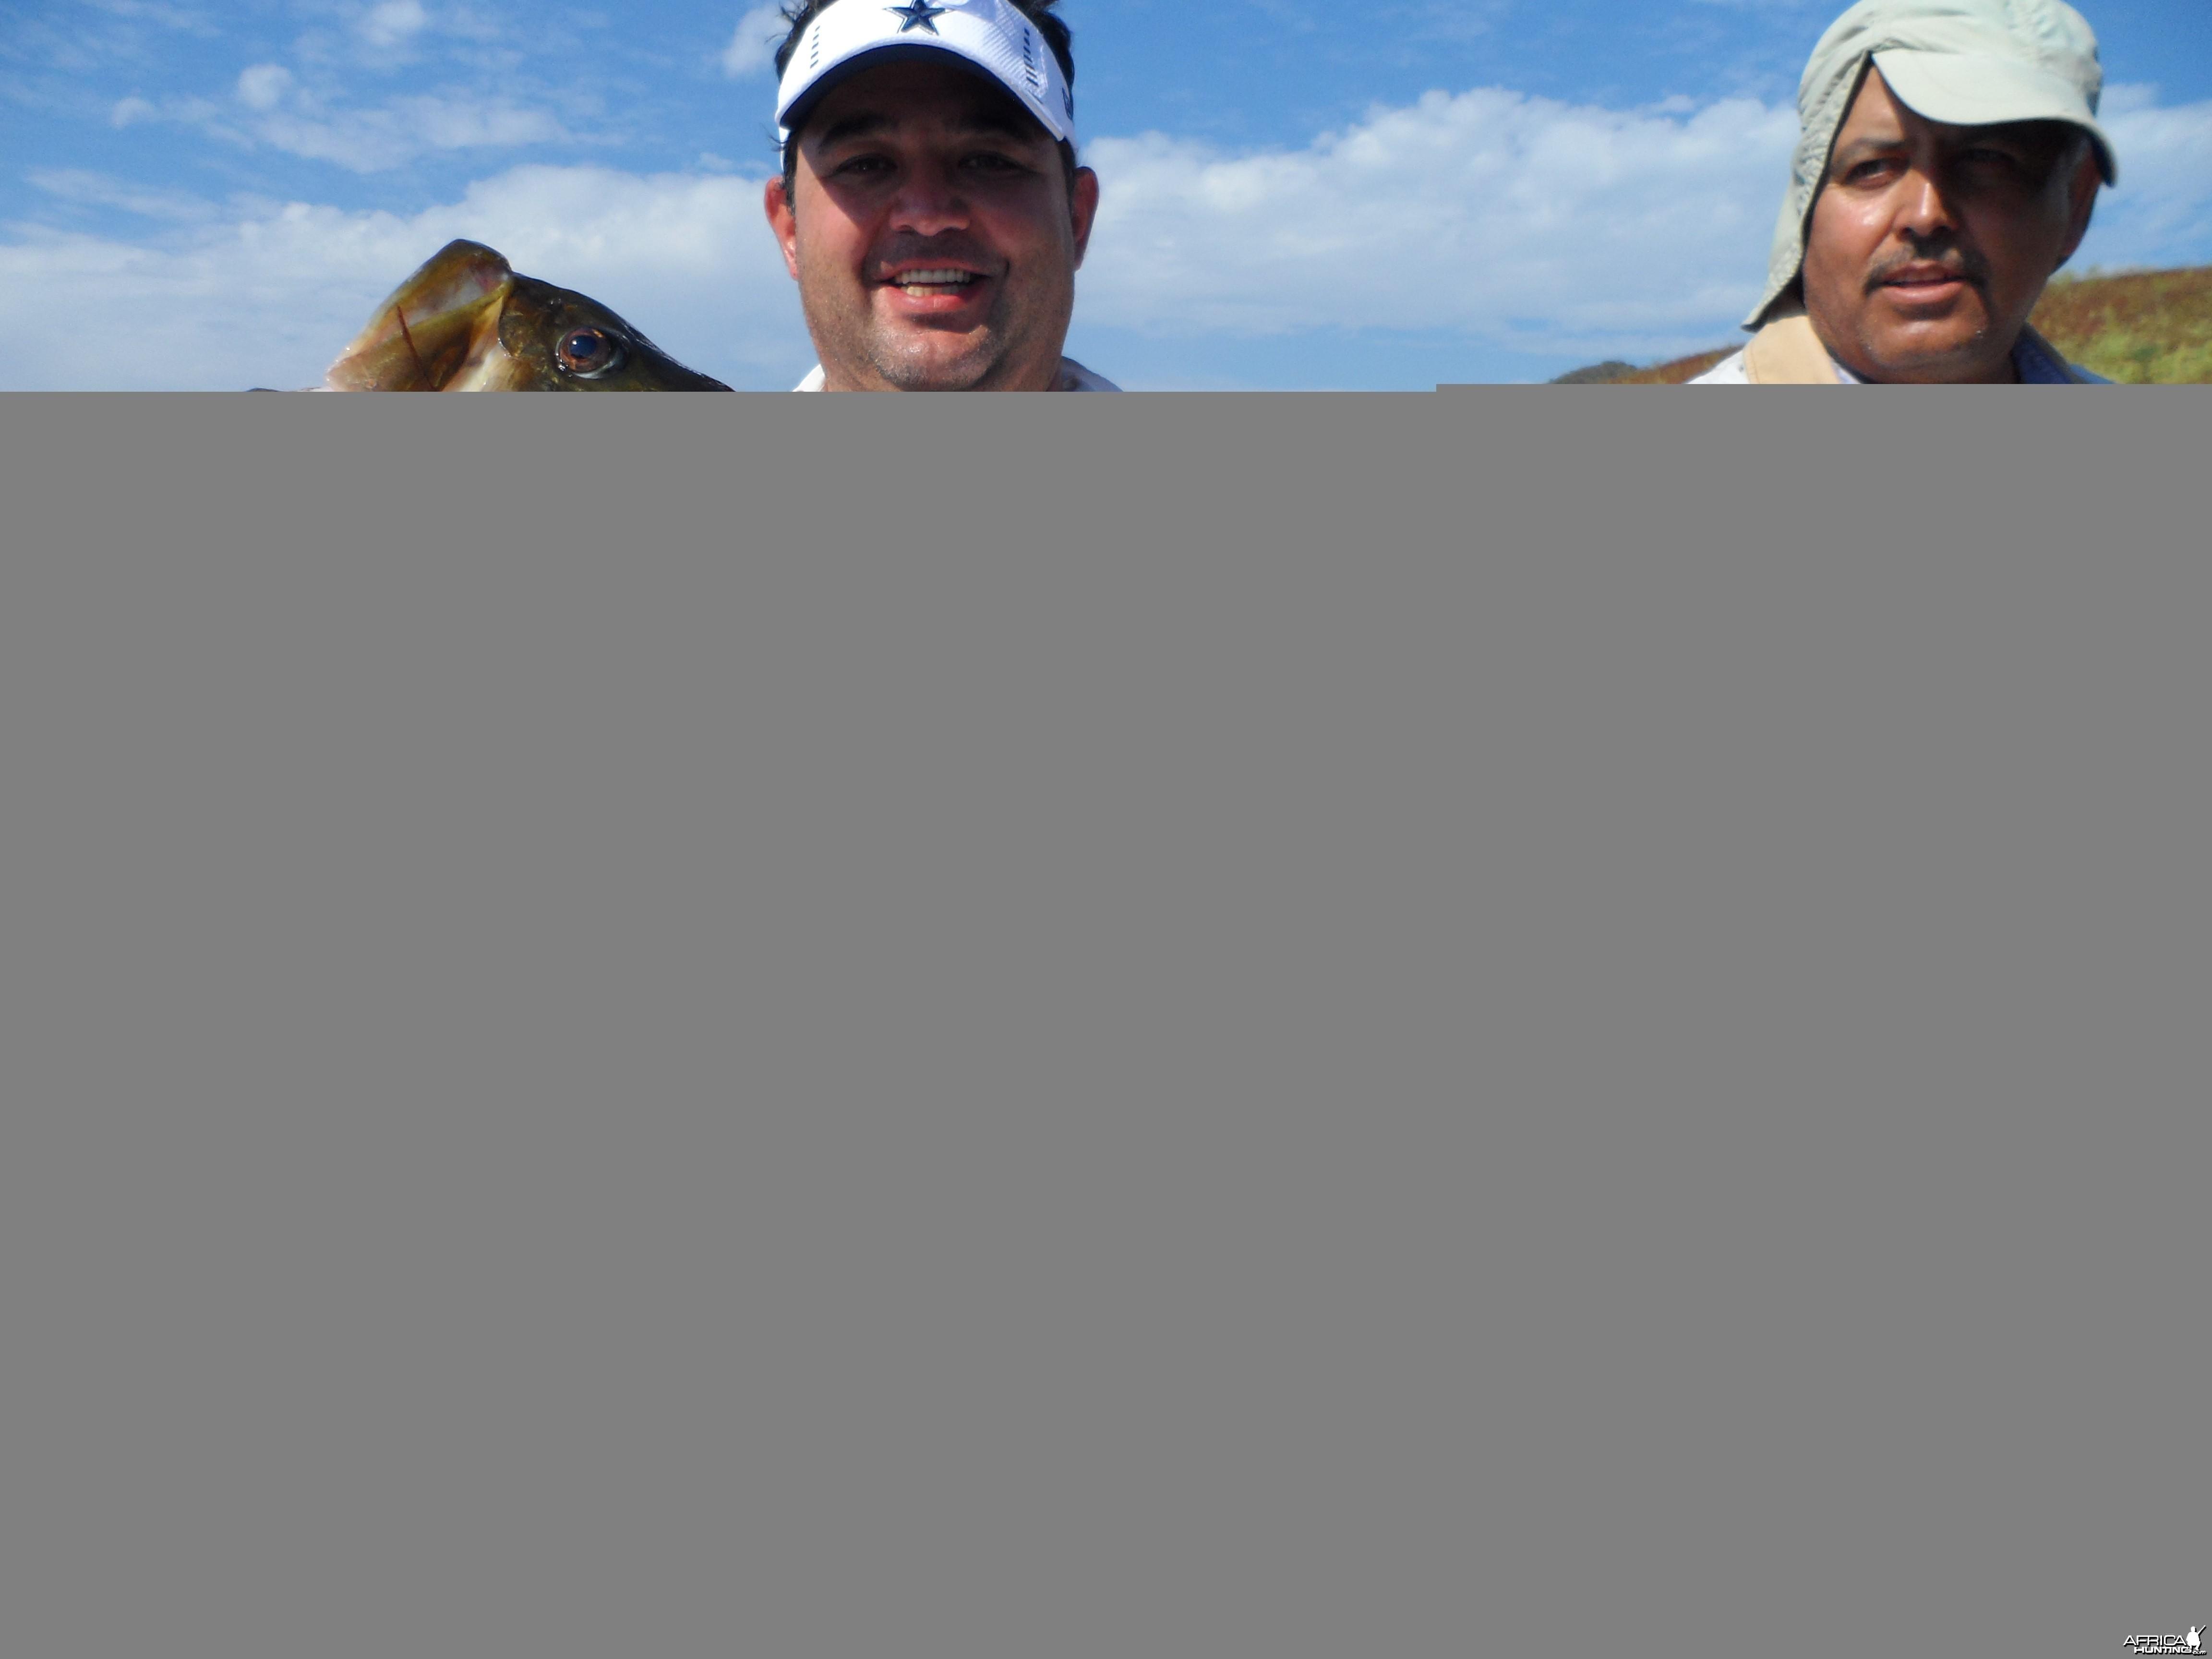 Bass of Sinaloa in Western Mexico